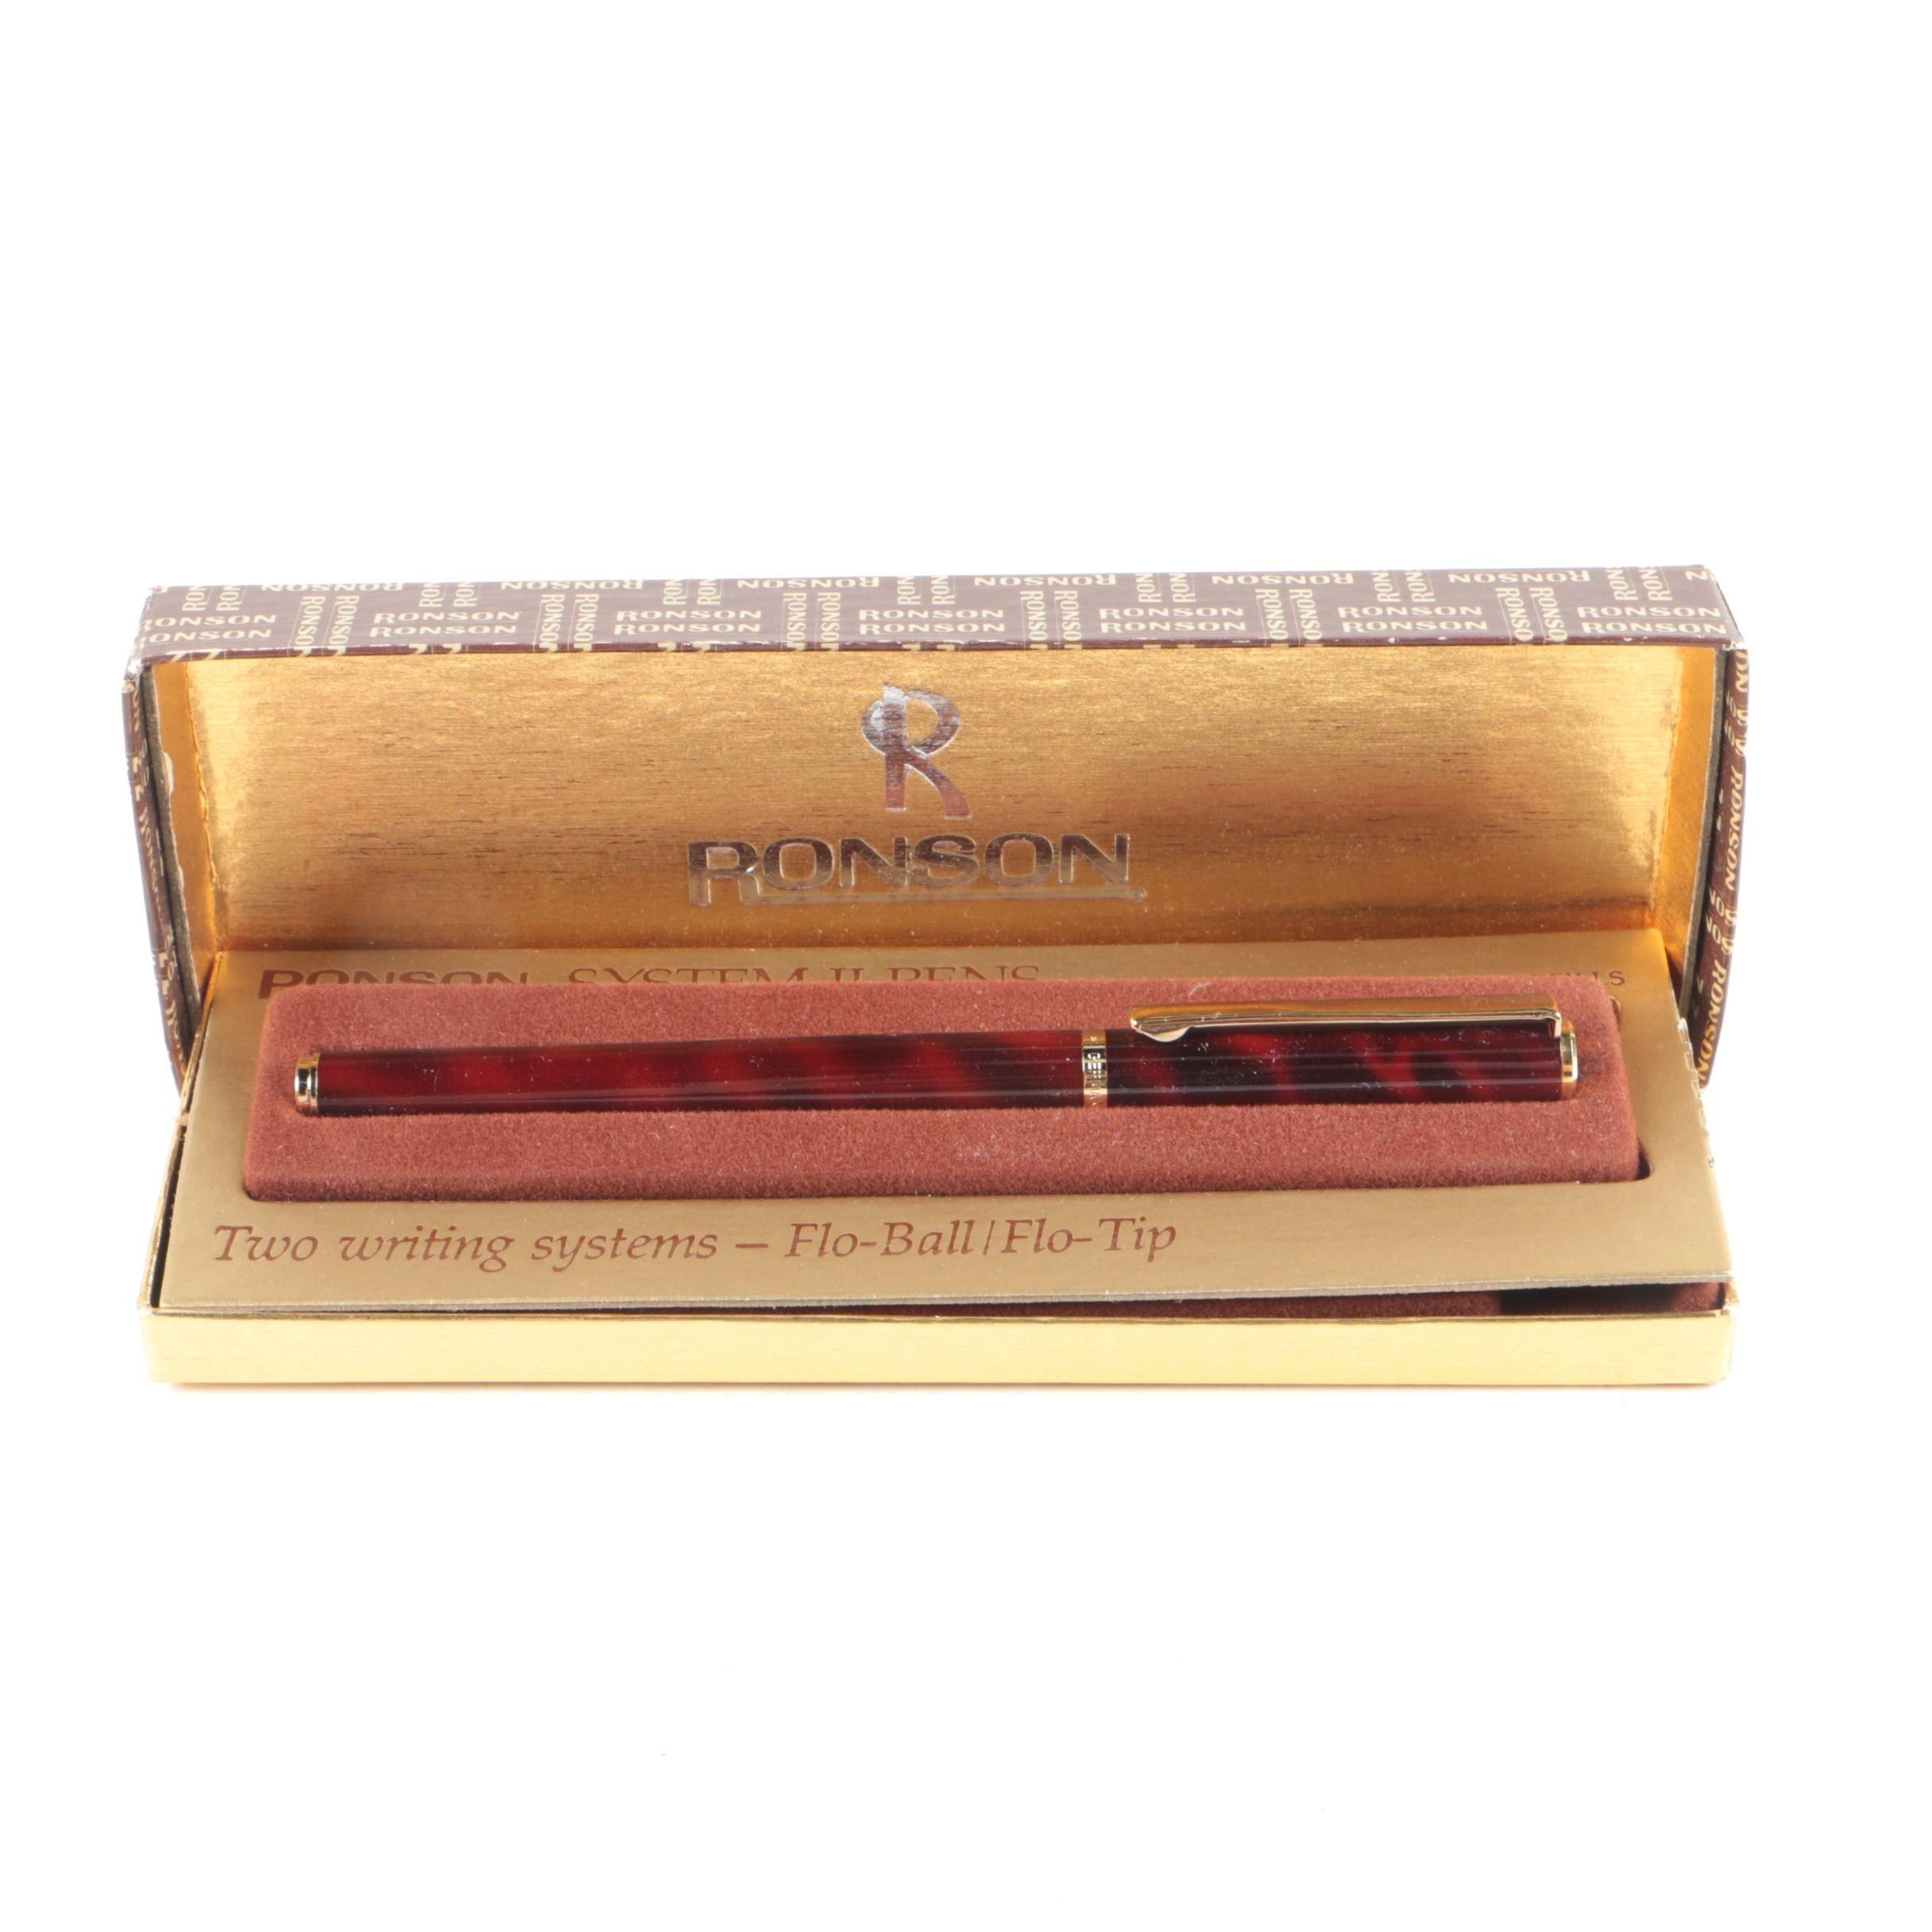 Ronson System II Pen